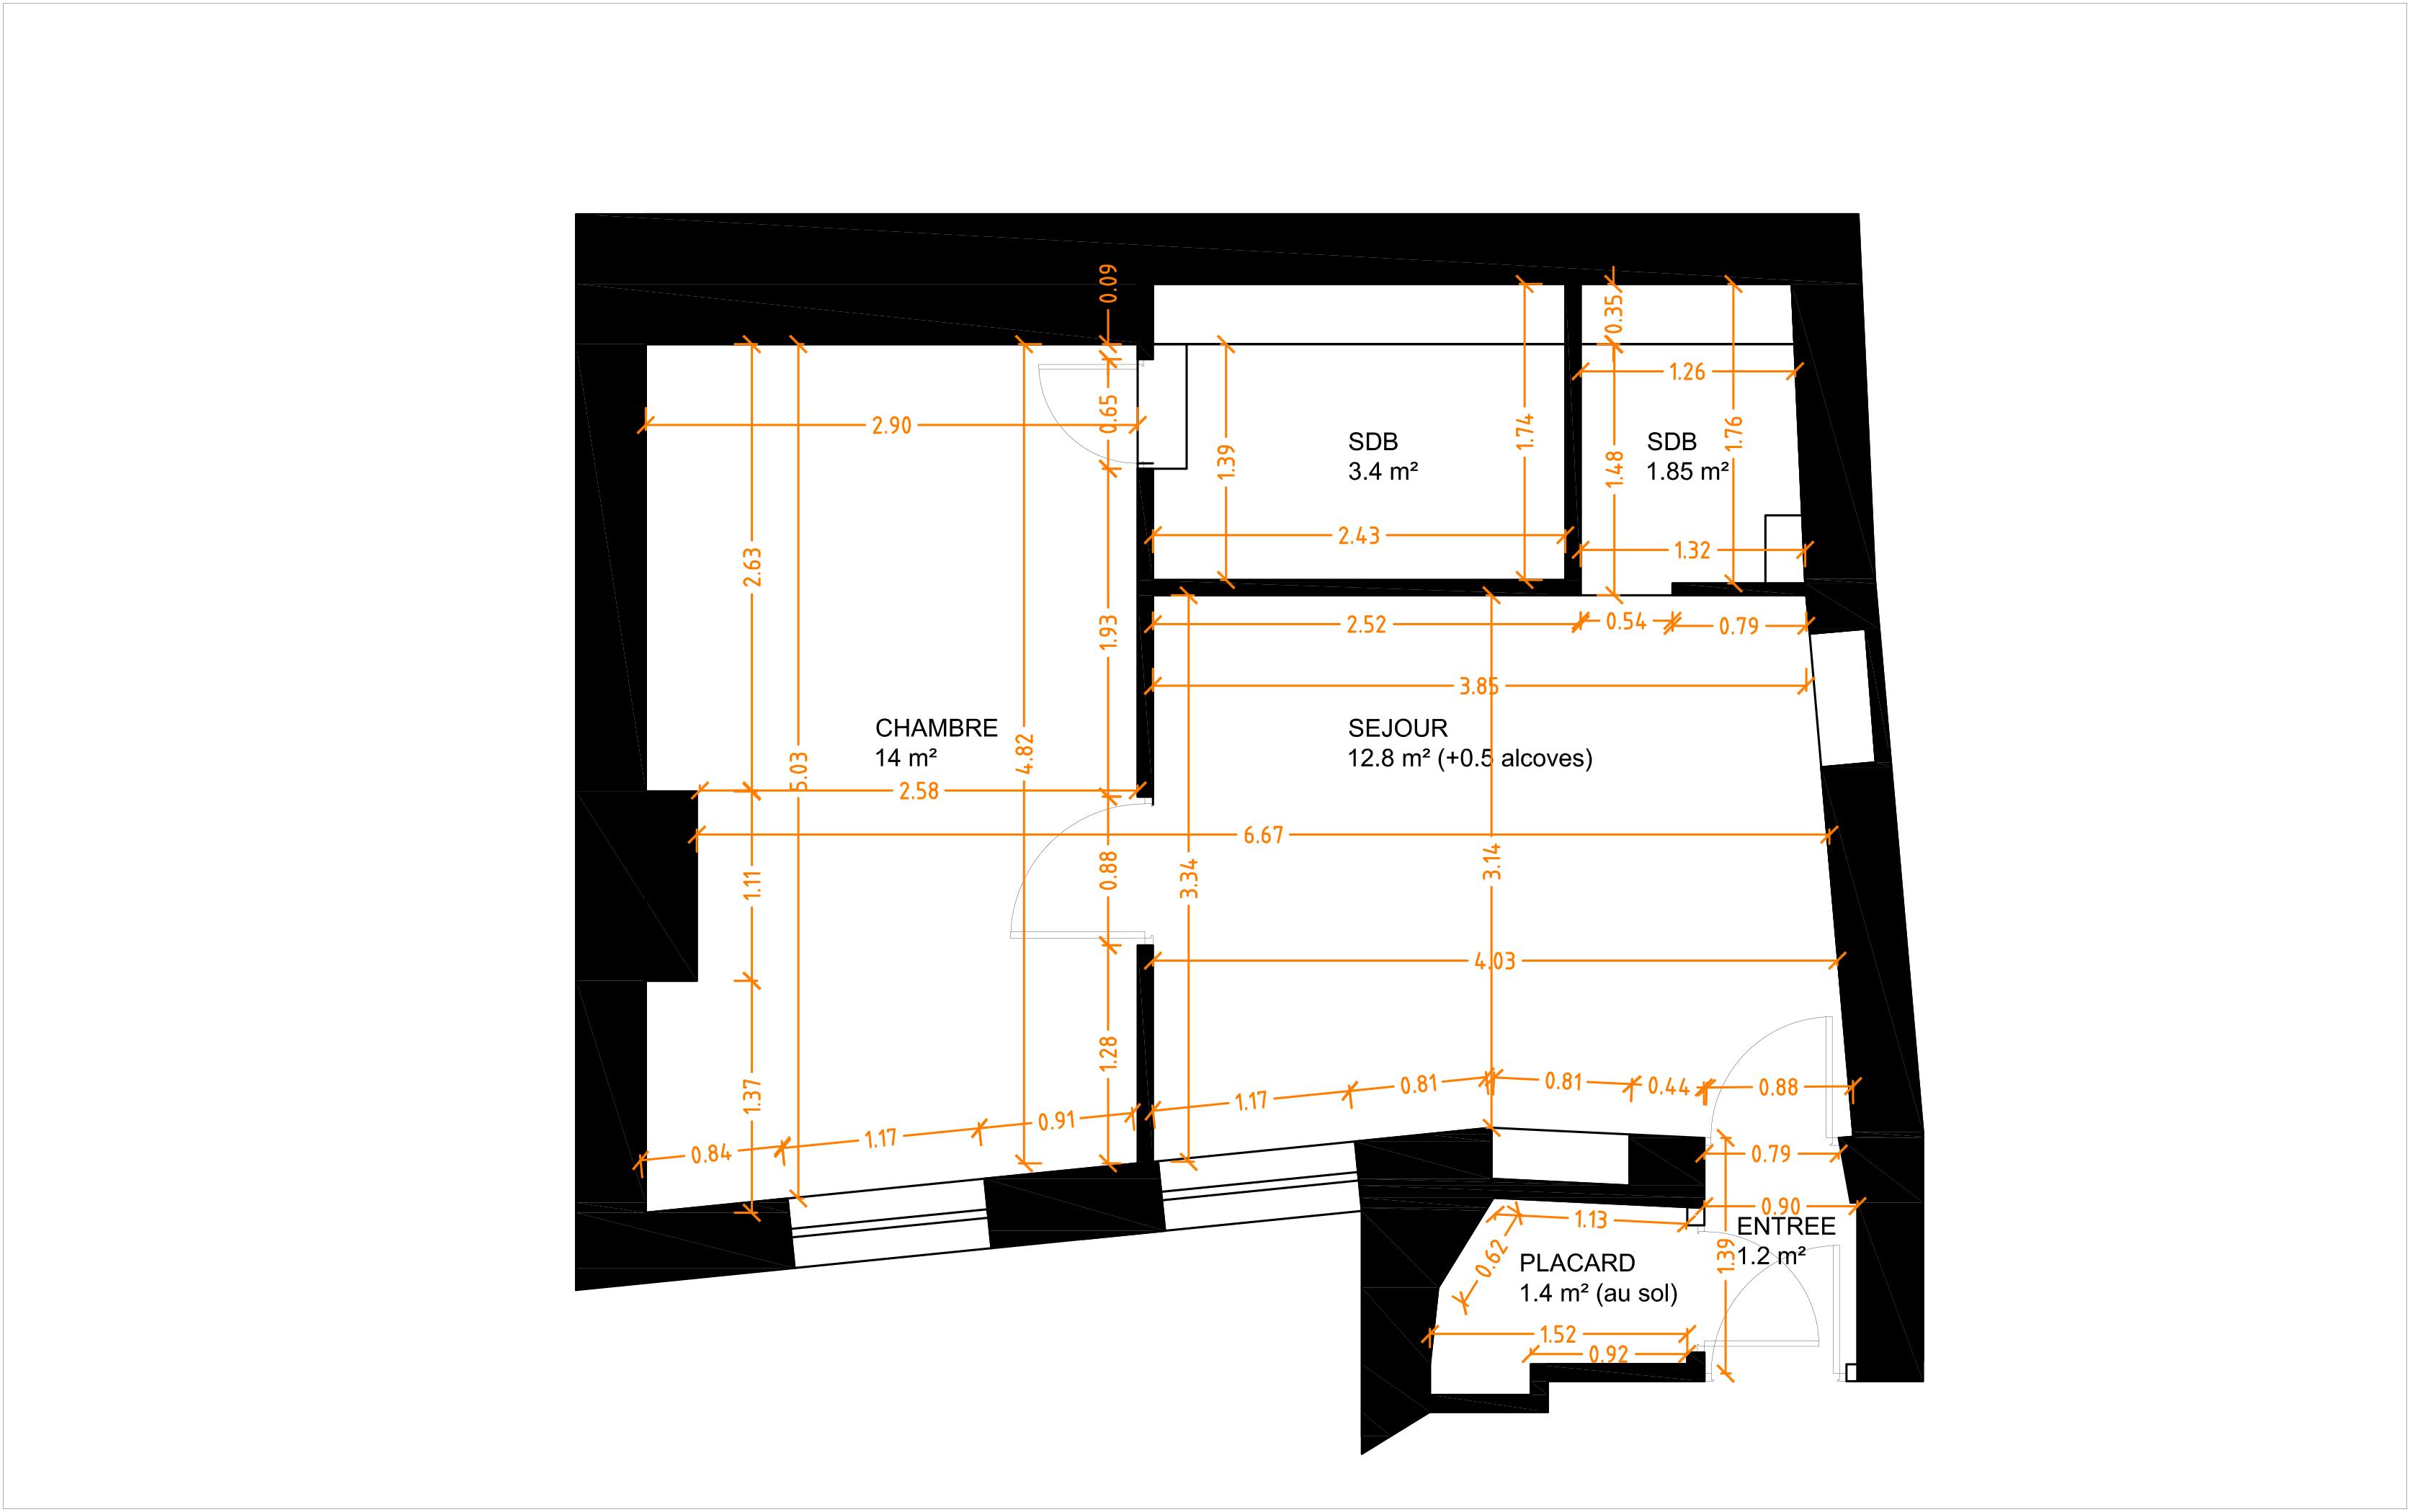 projet notre dame architecte renovation paris. Black Bedroom Furniture Sets. Home Design Ideas